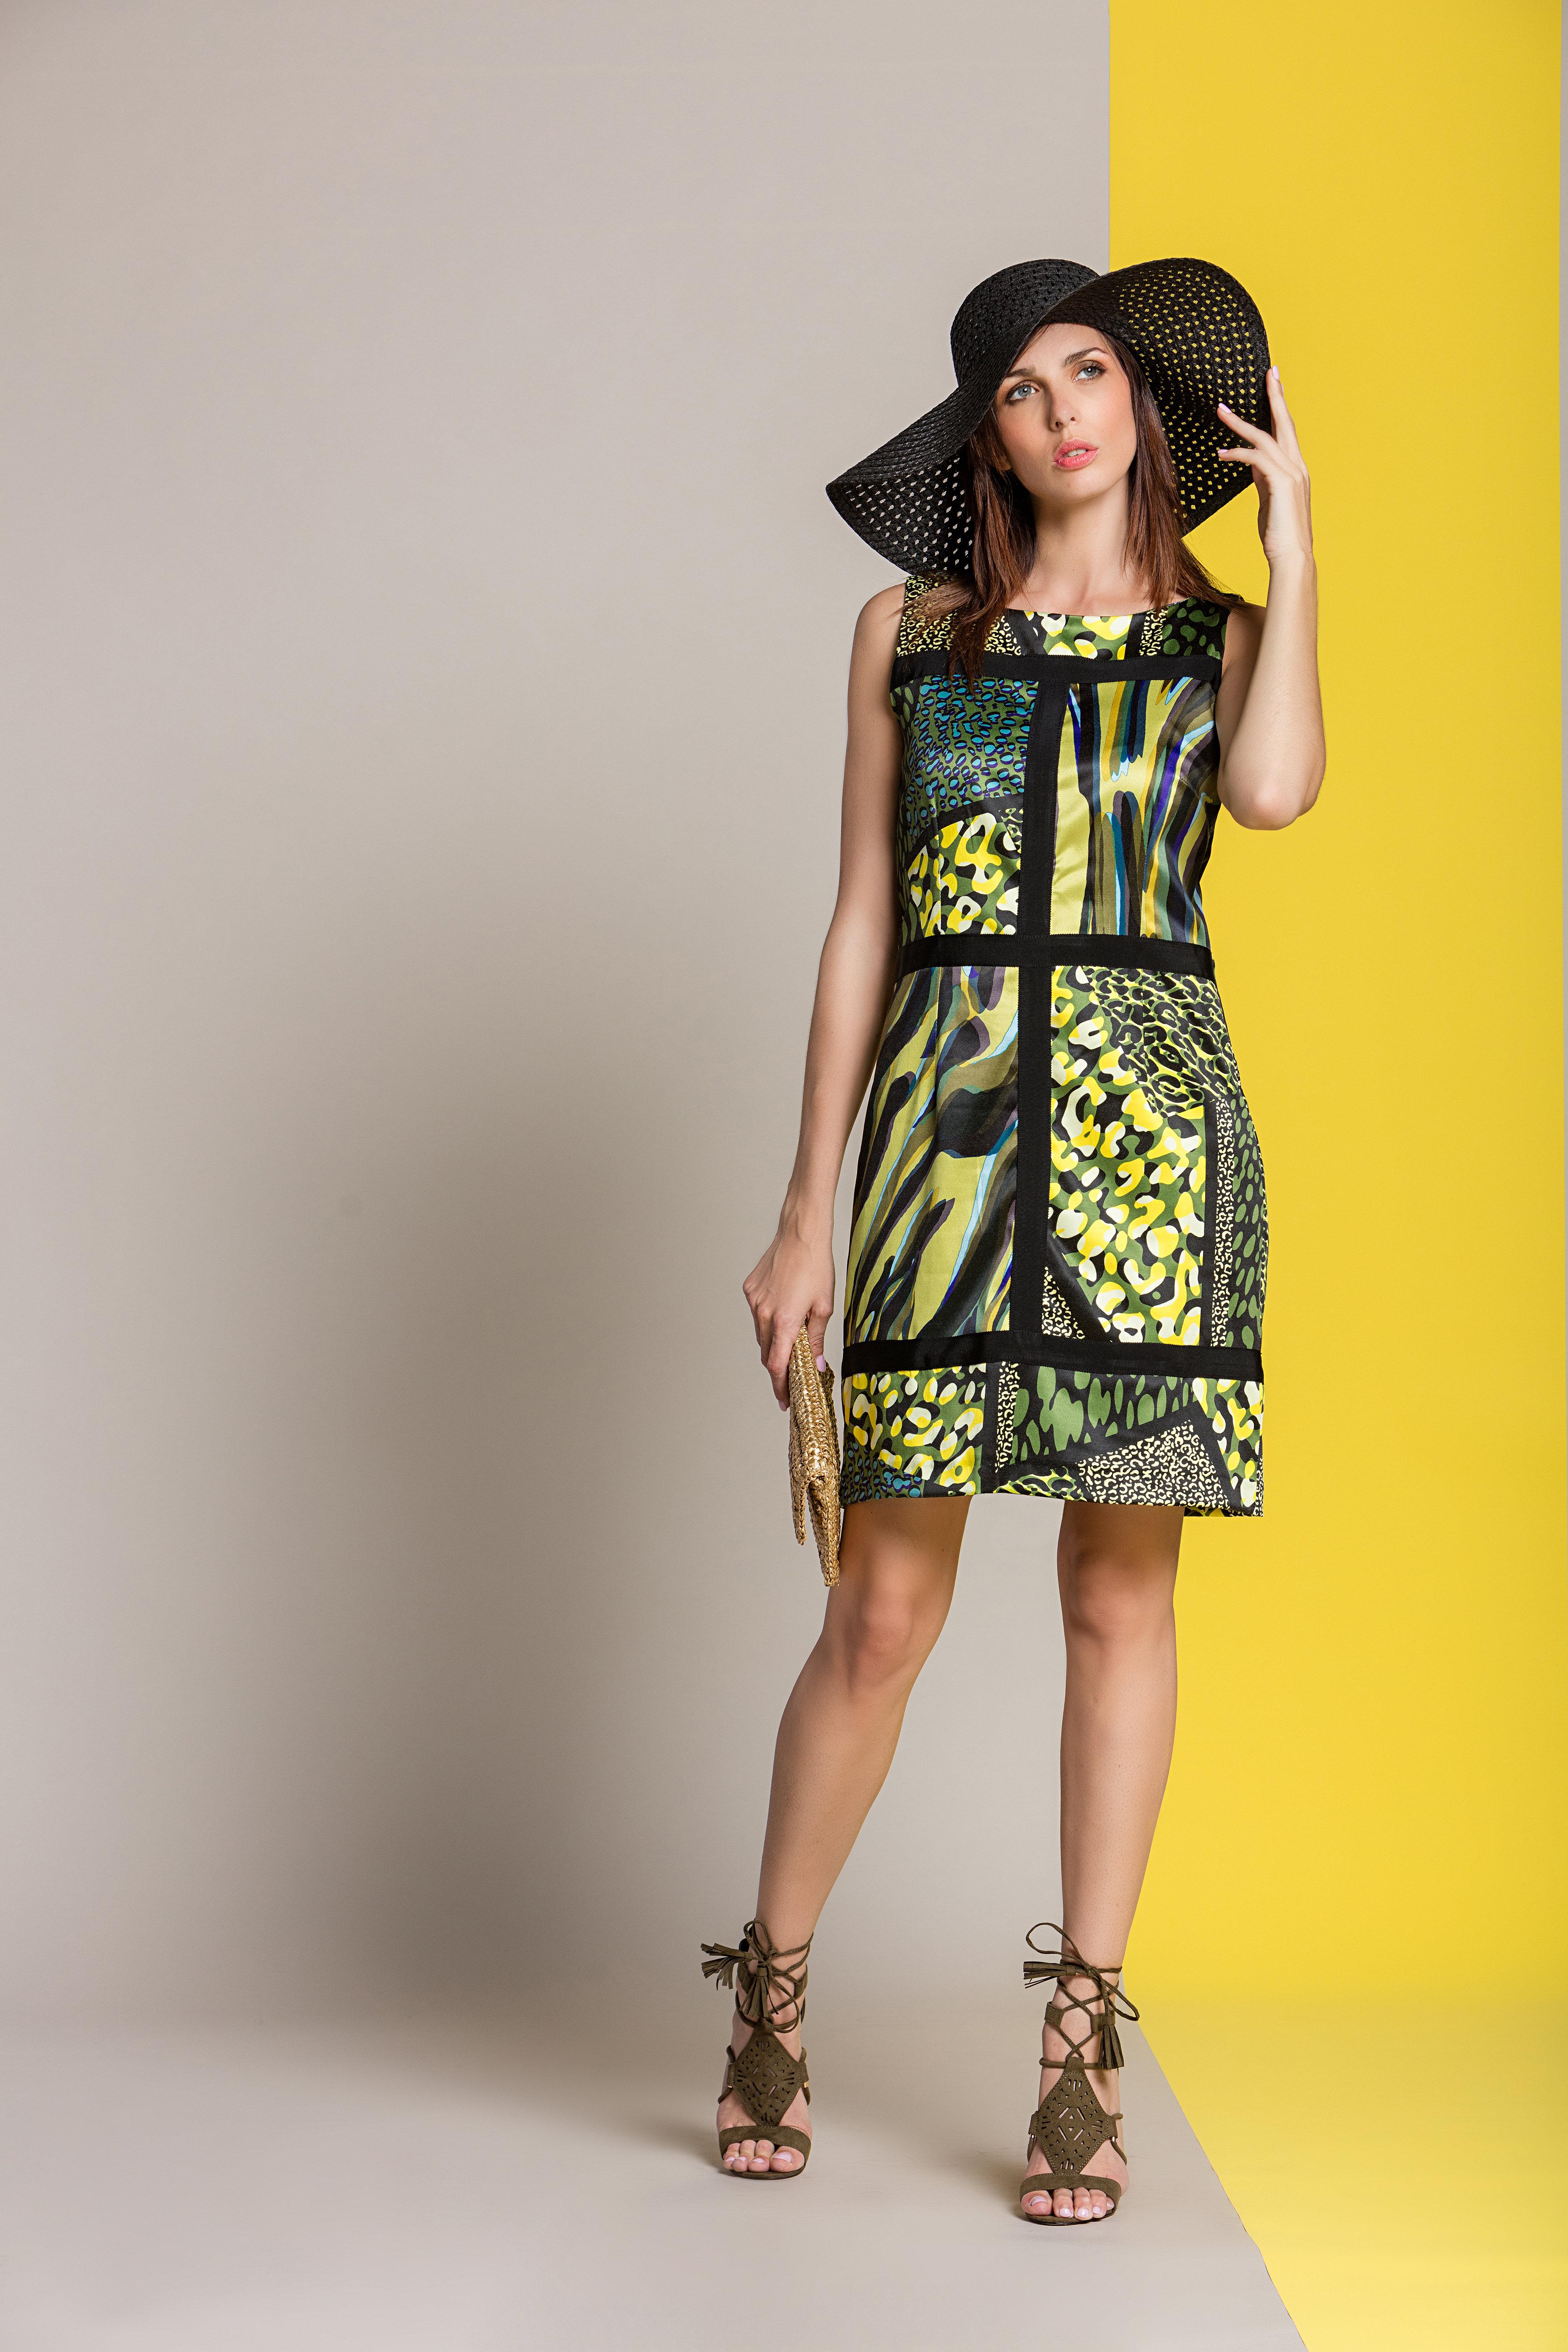 Paul Brial: Olive Martini Colorblock Sundress (1 Left!) PB_FREE